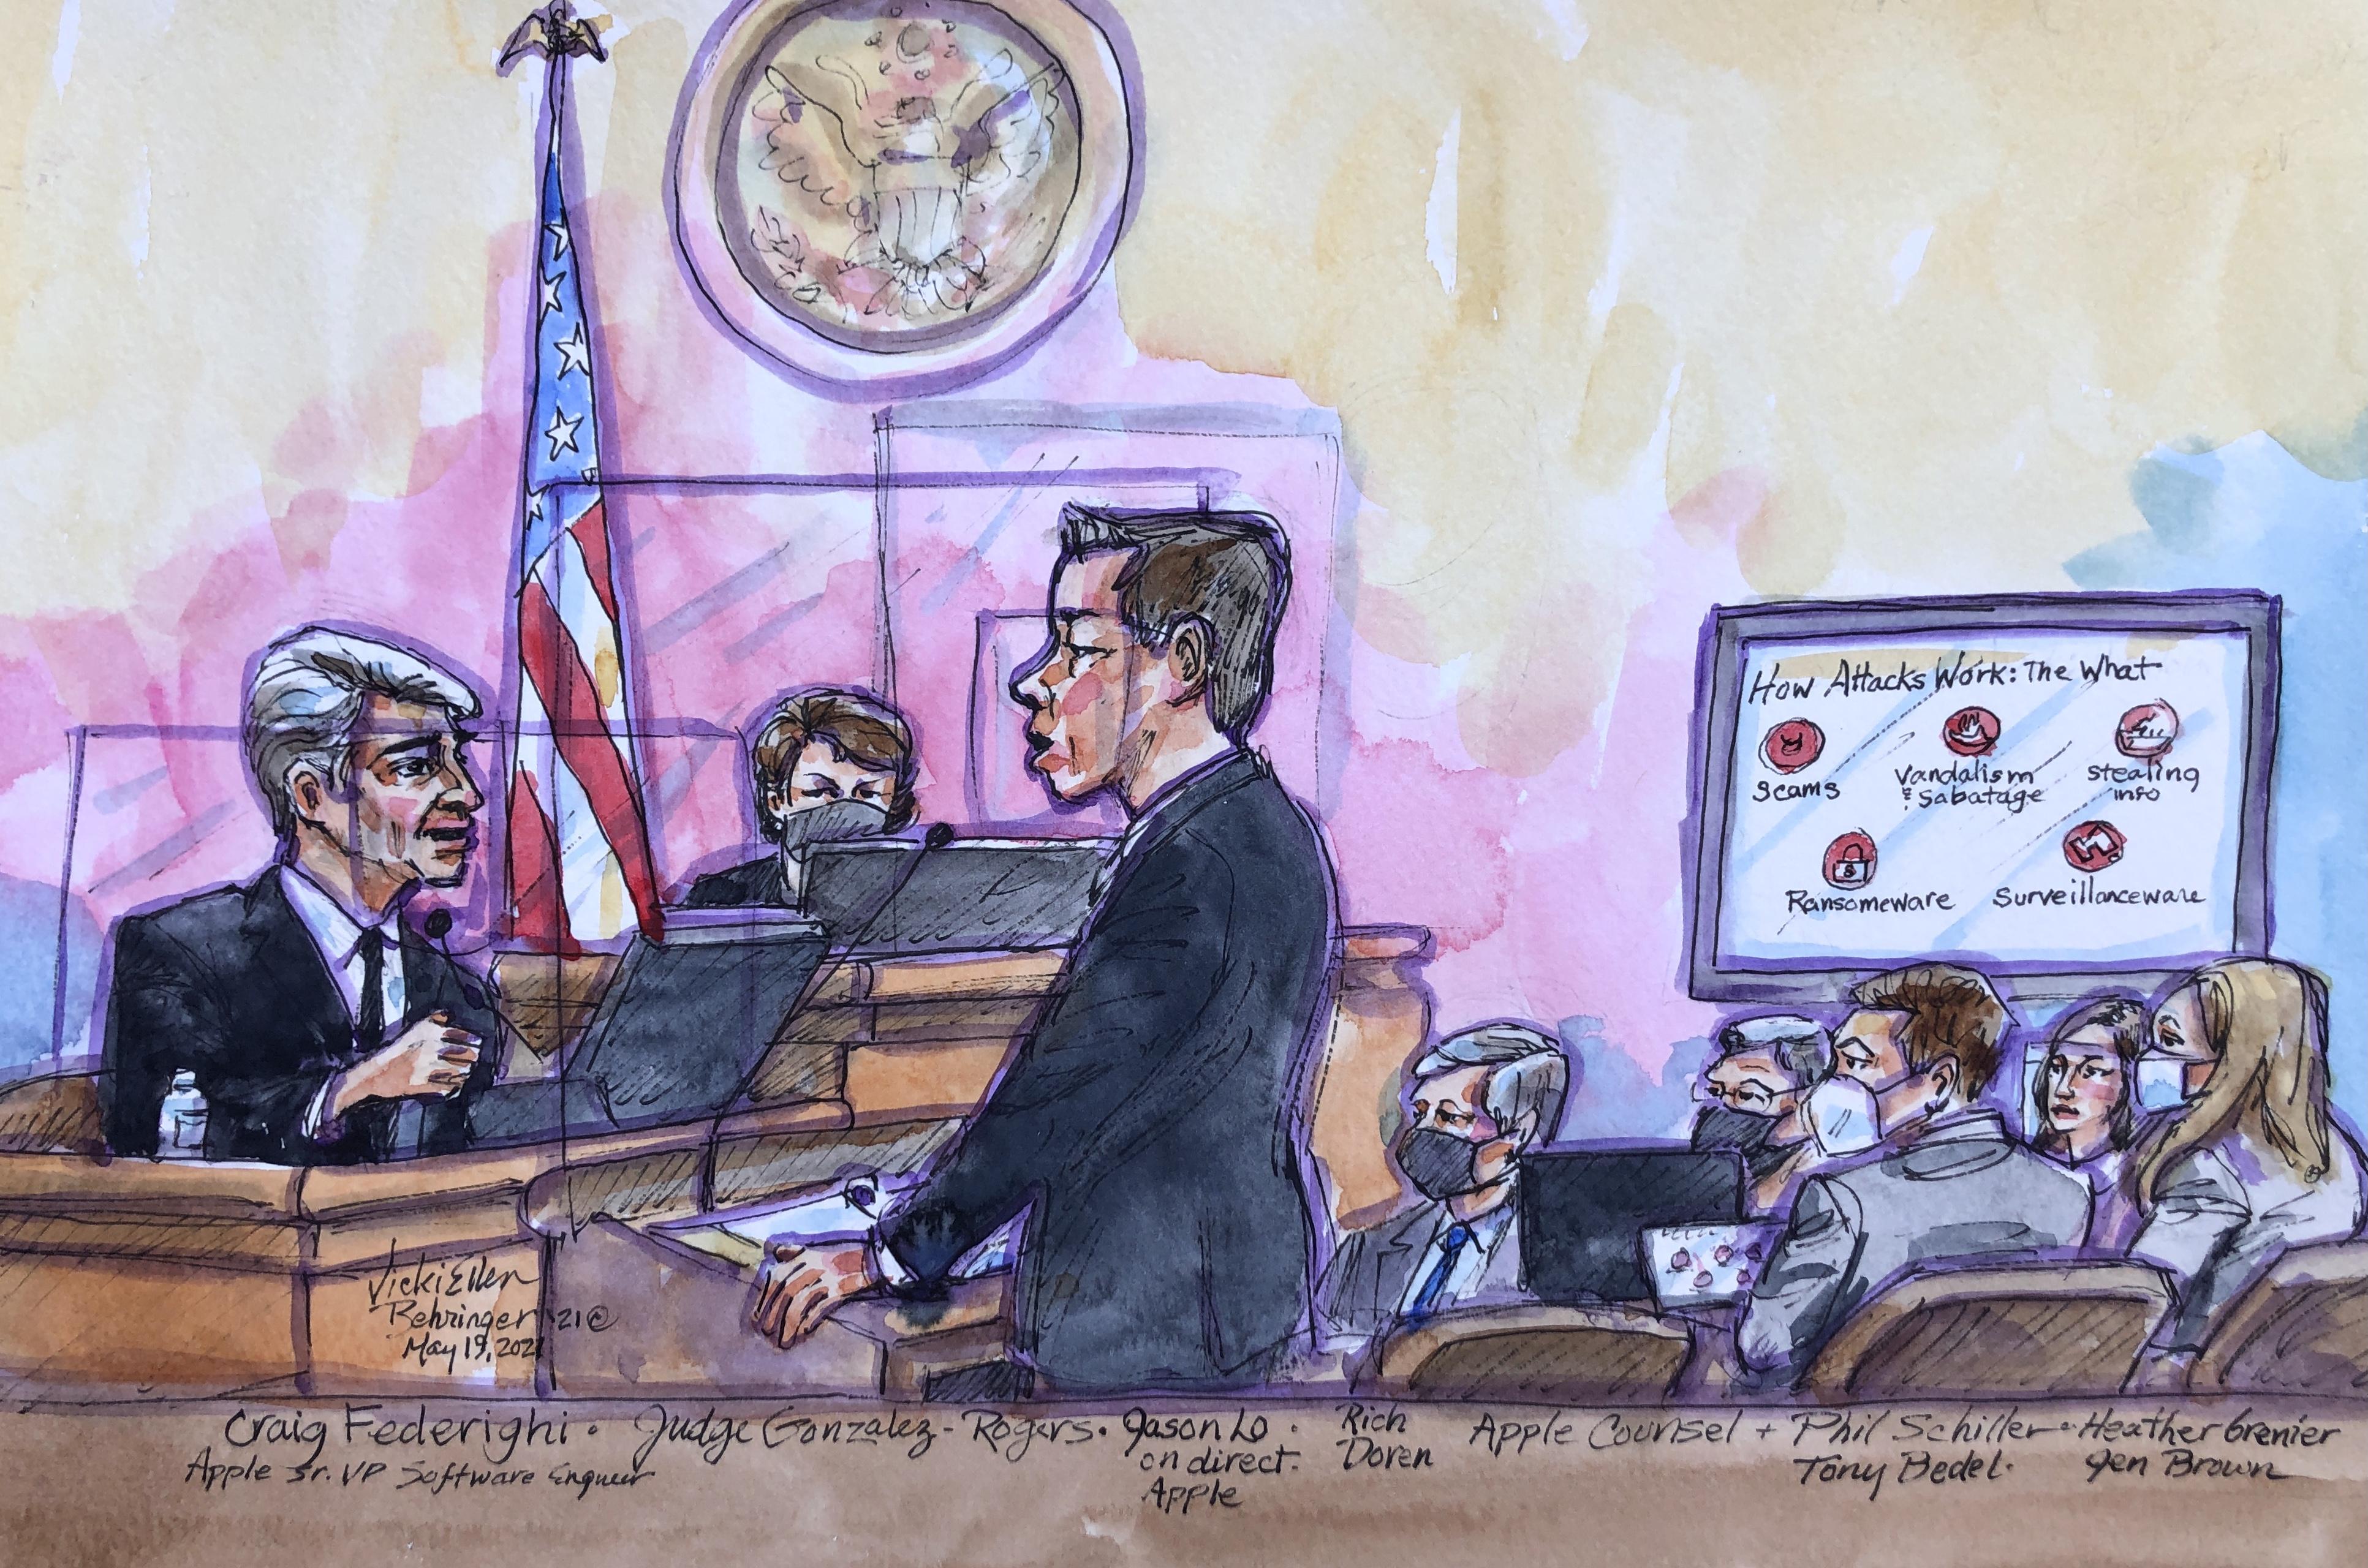 Craig Federighi addresses the court